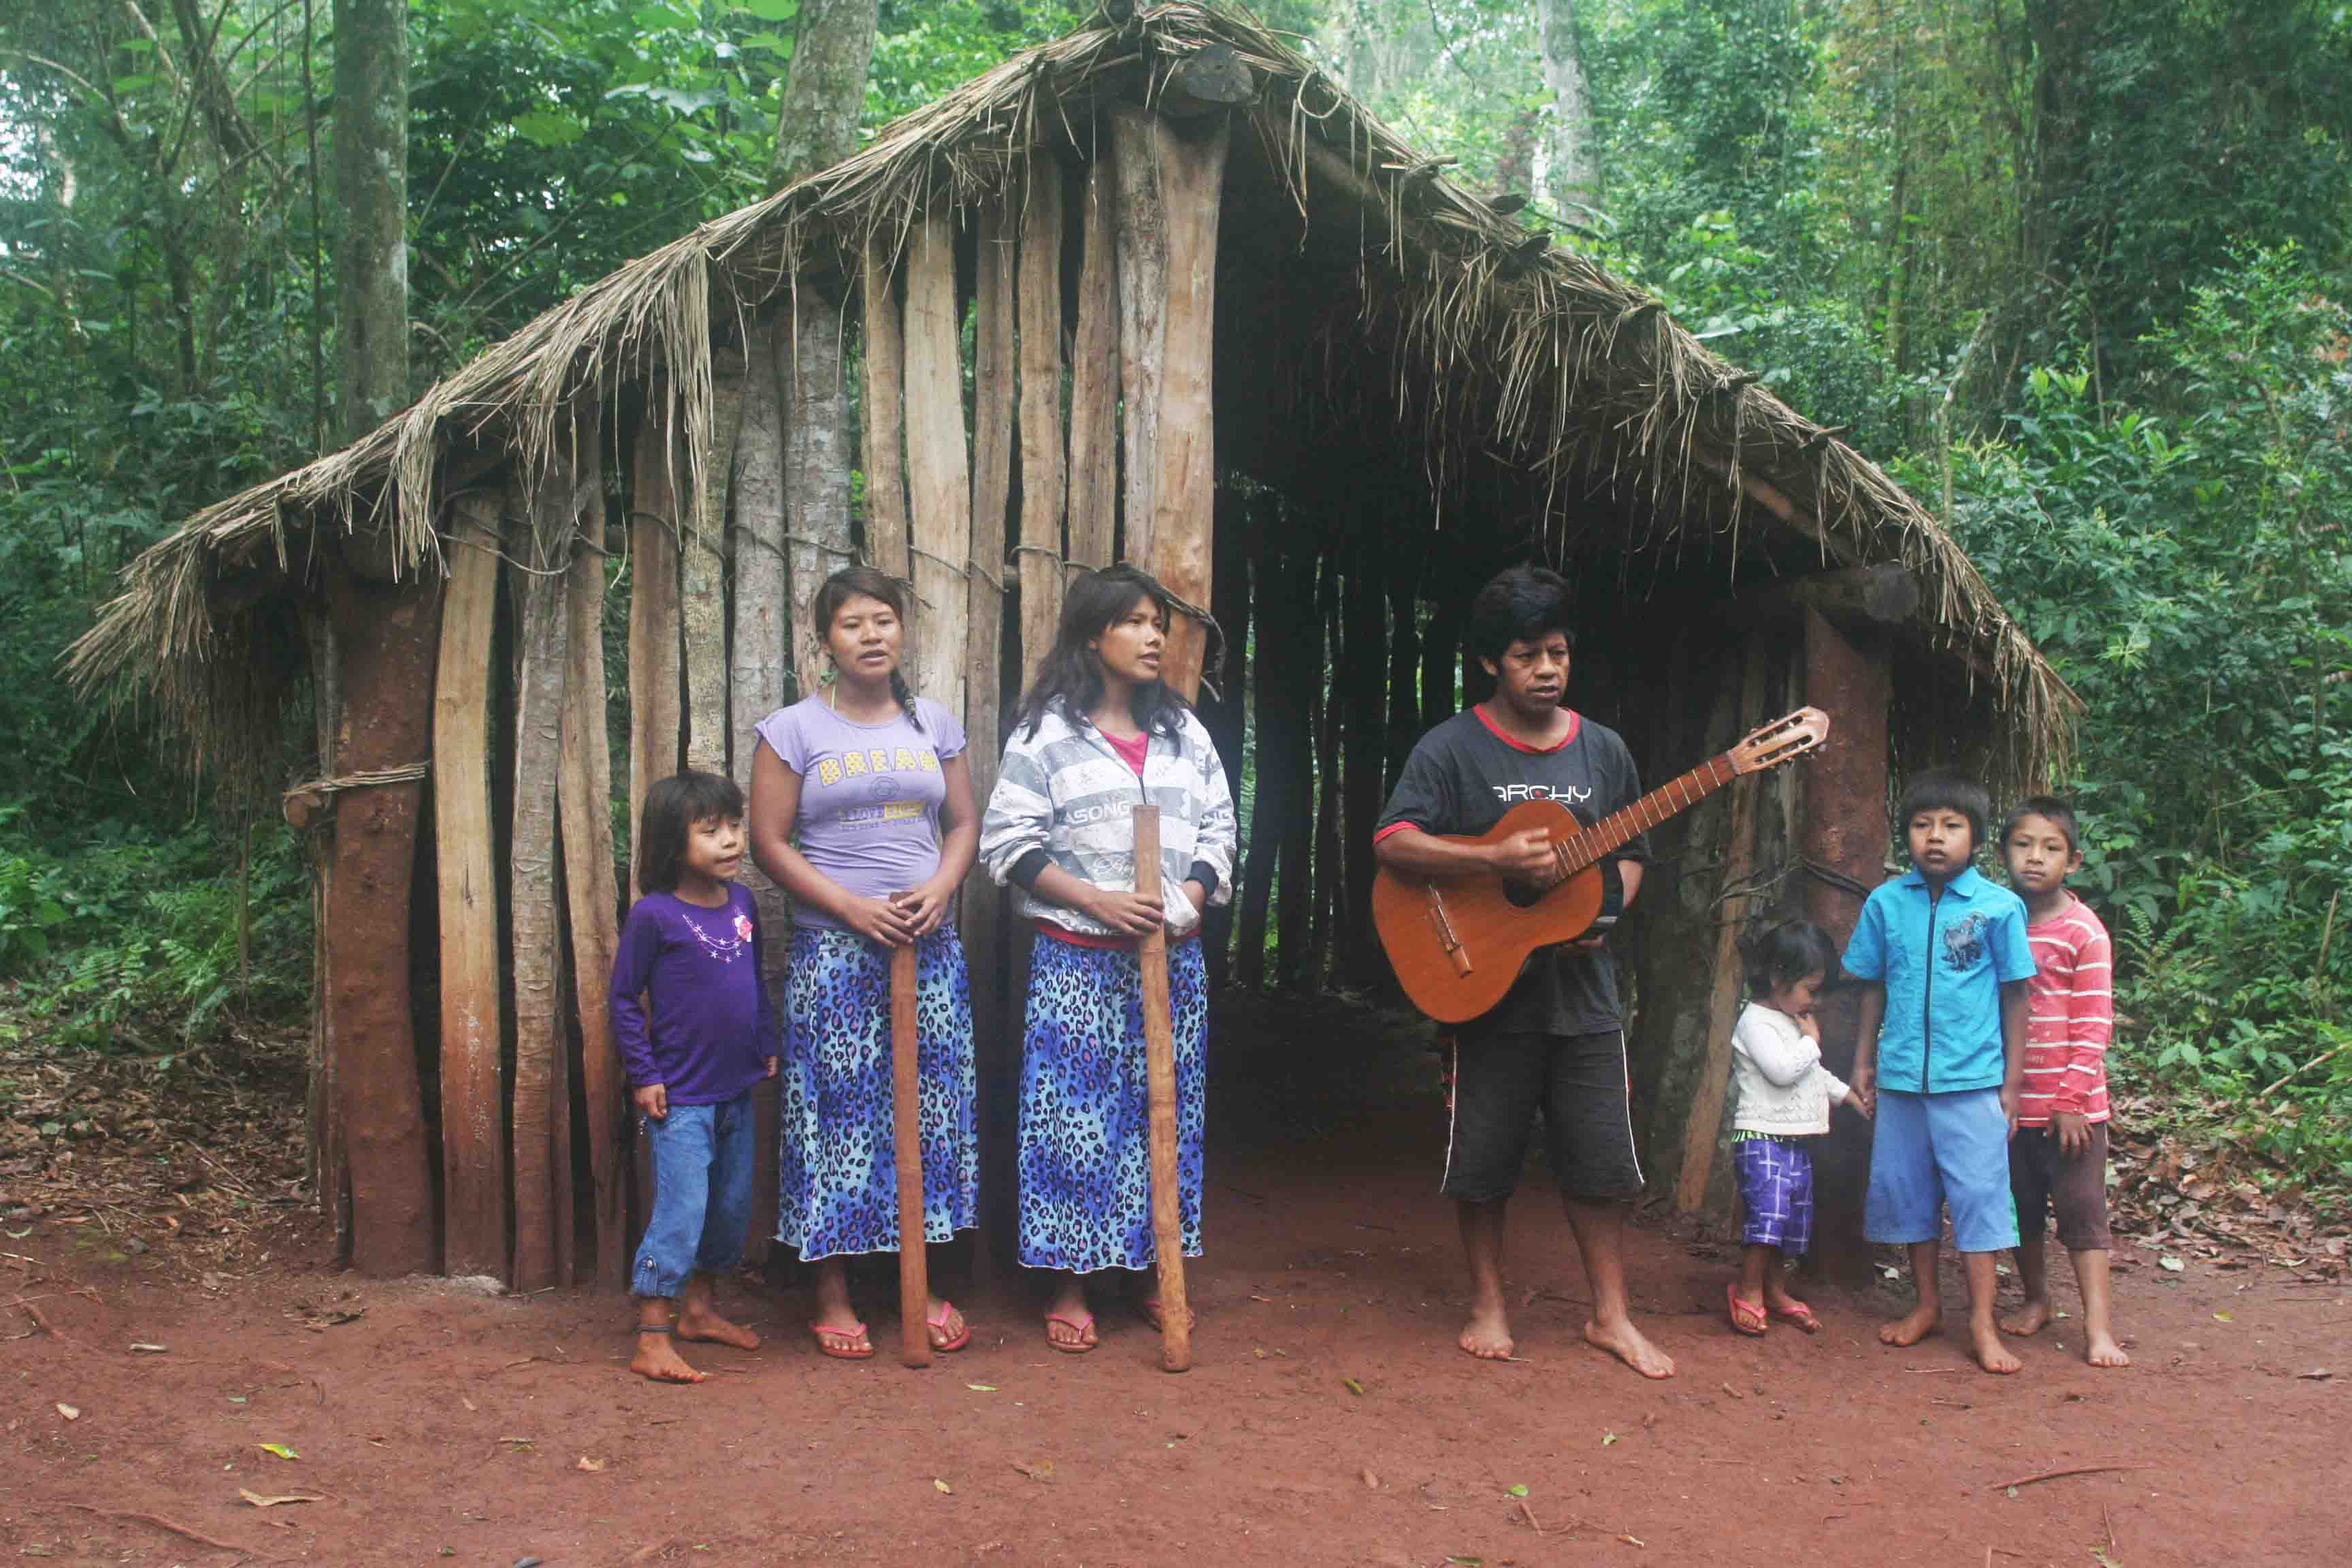 Aboriginal tribes